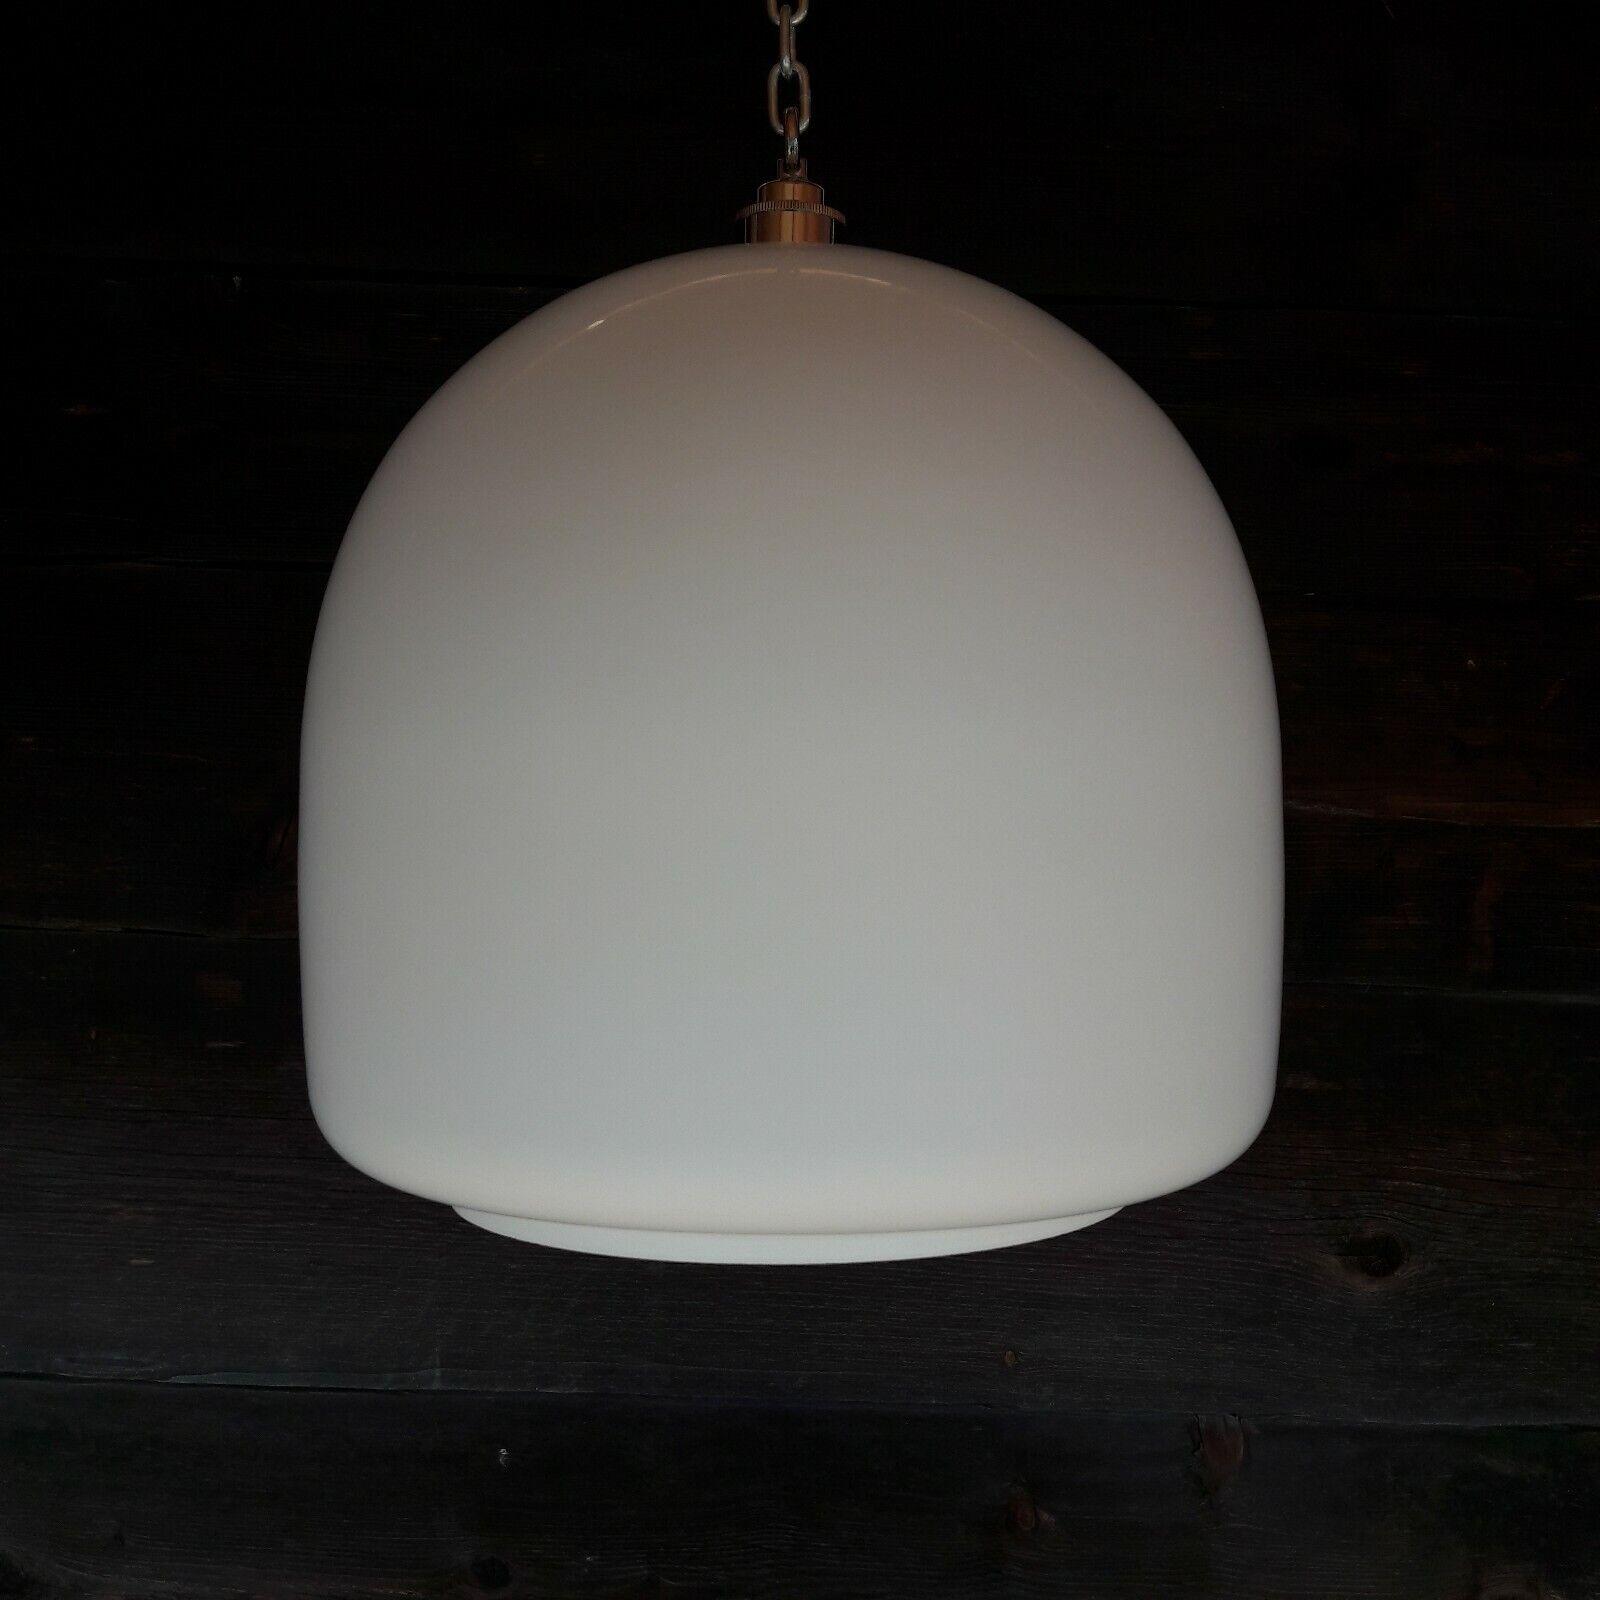 LARGE ANTIQUE EUROPEAN OPALINE Weiß GLASS PENDANT CEILING LIGHT